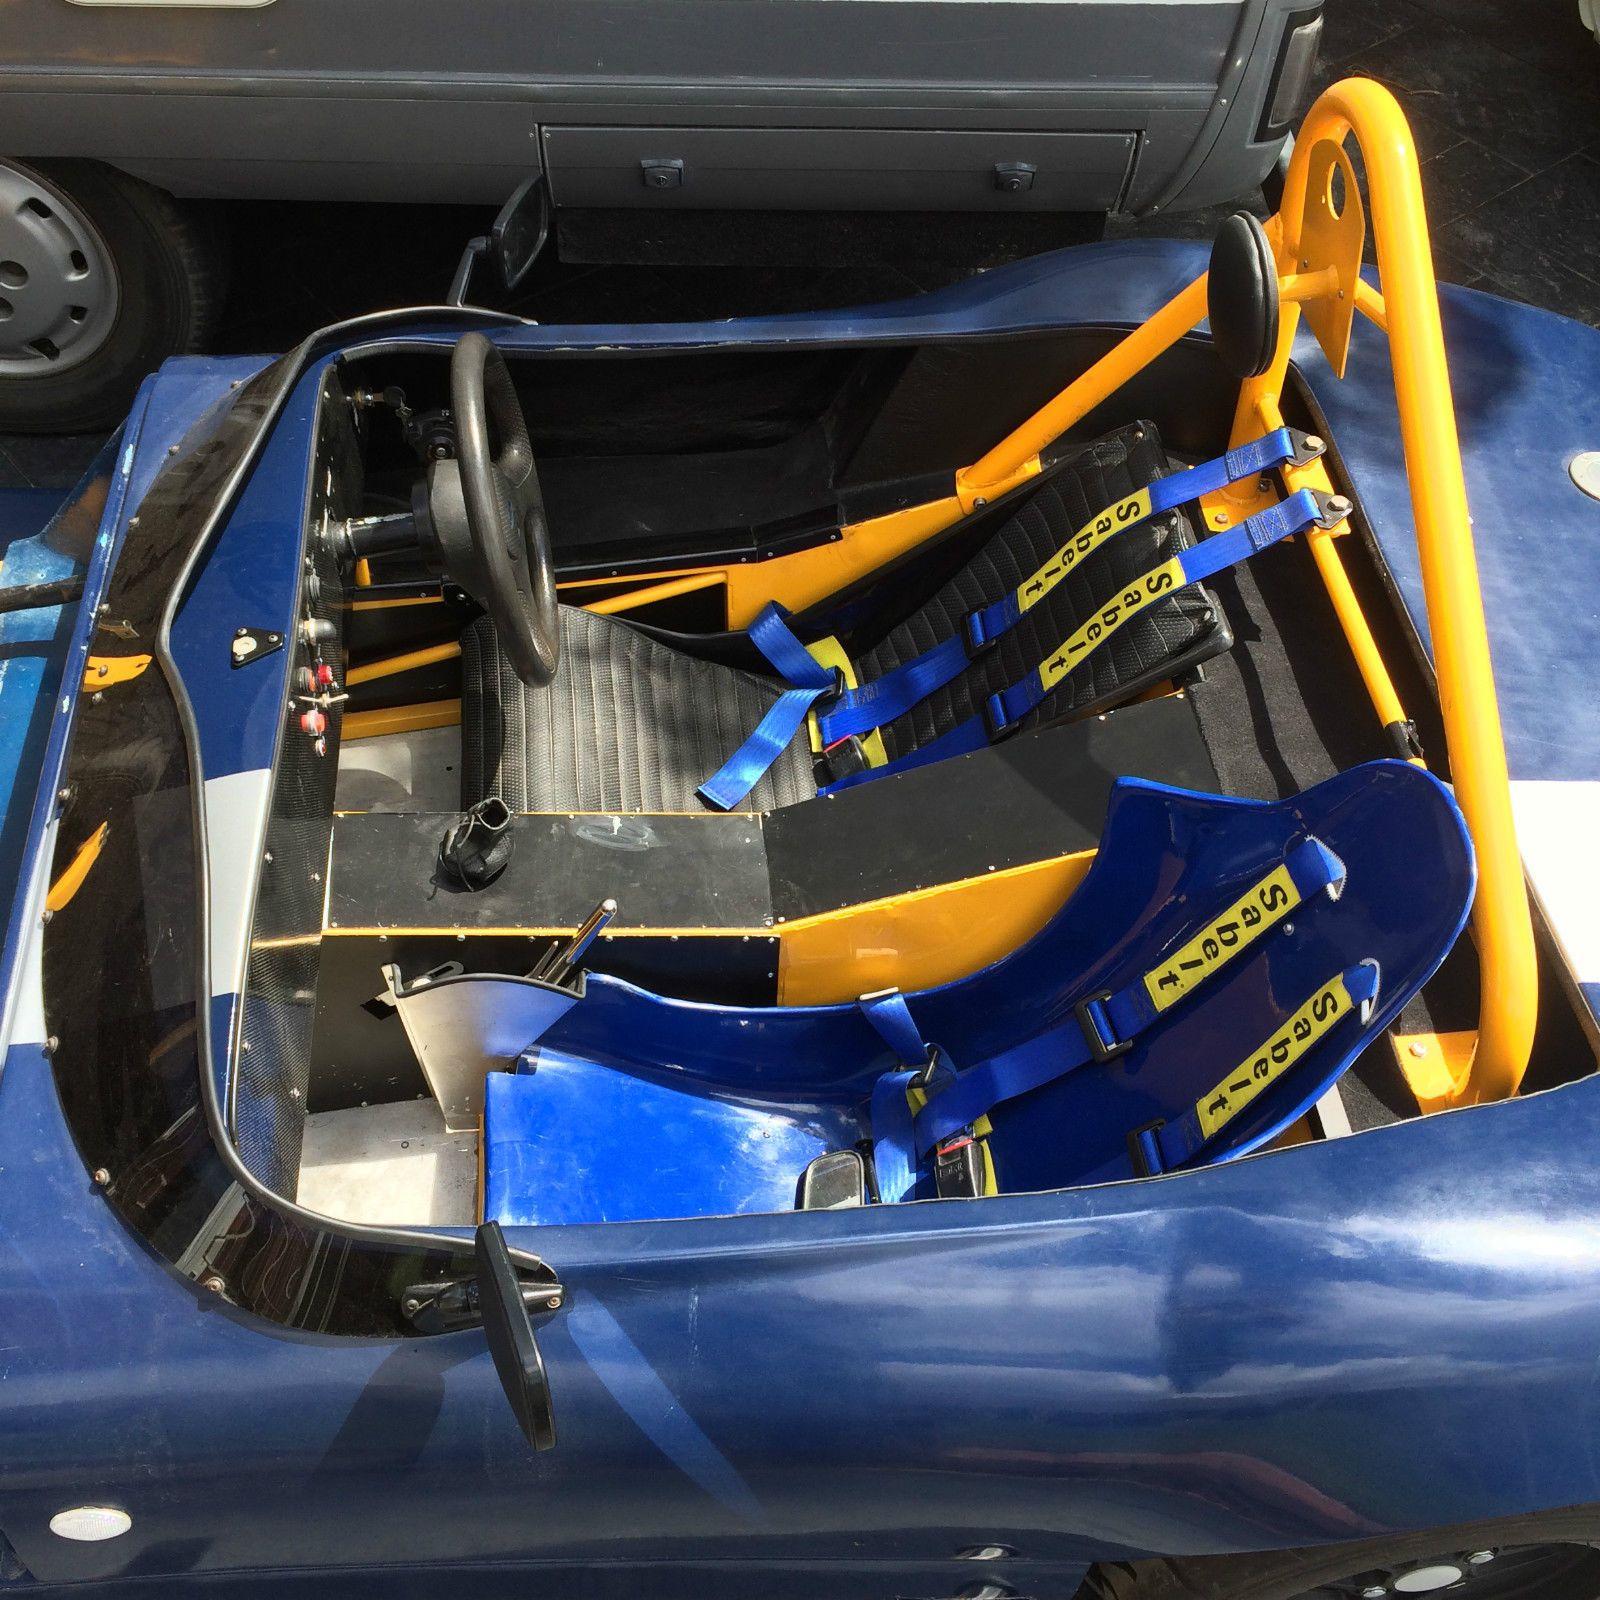 Fisher Fury Spyder Kit Car, Westfield, Caterham, Sylva